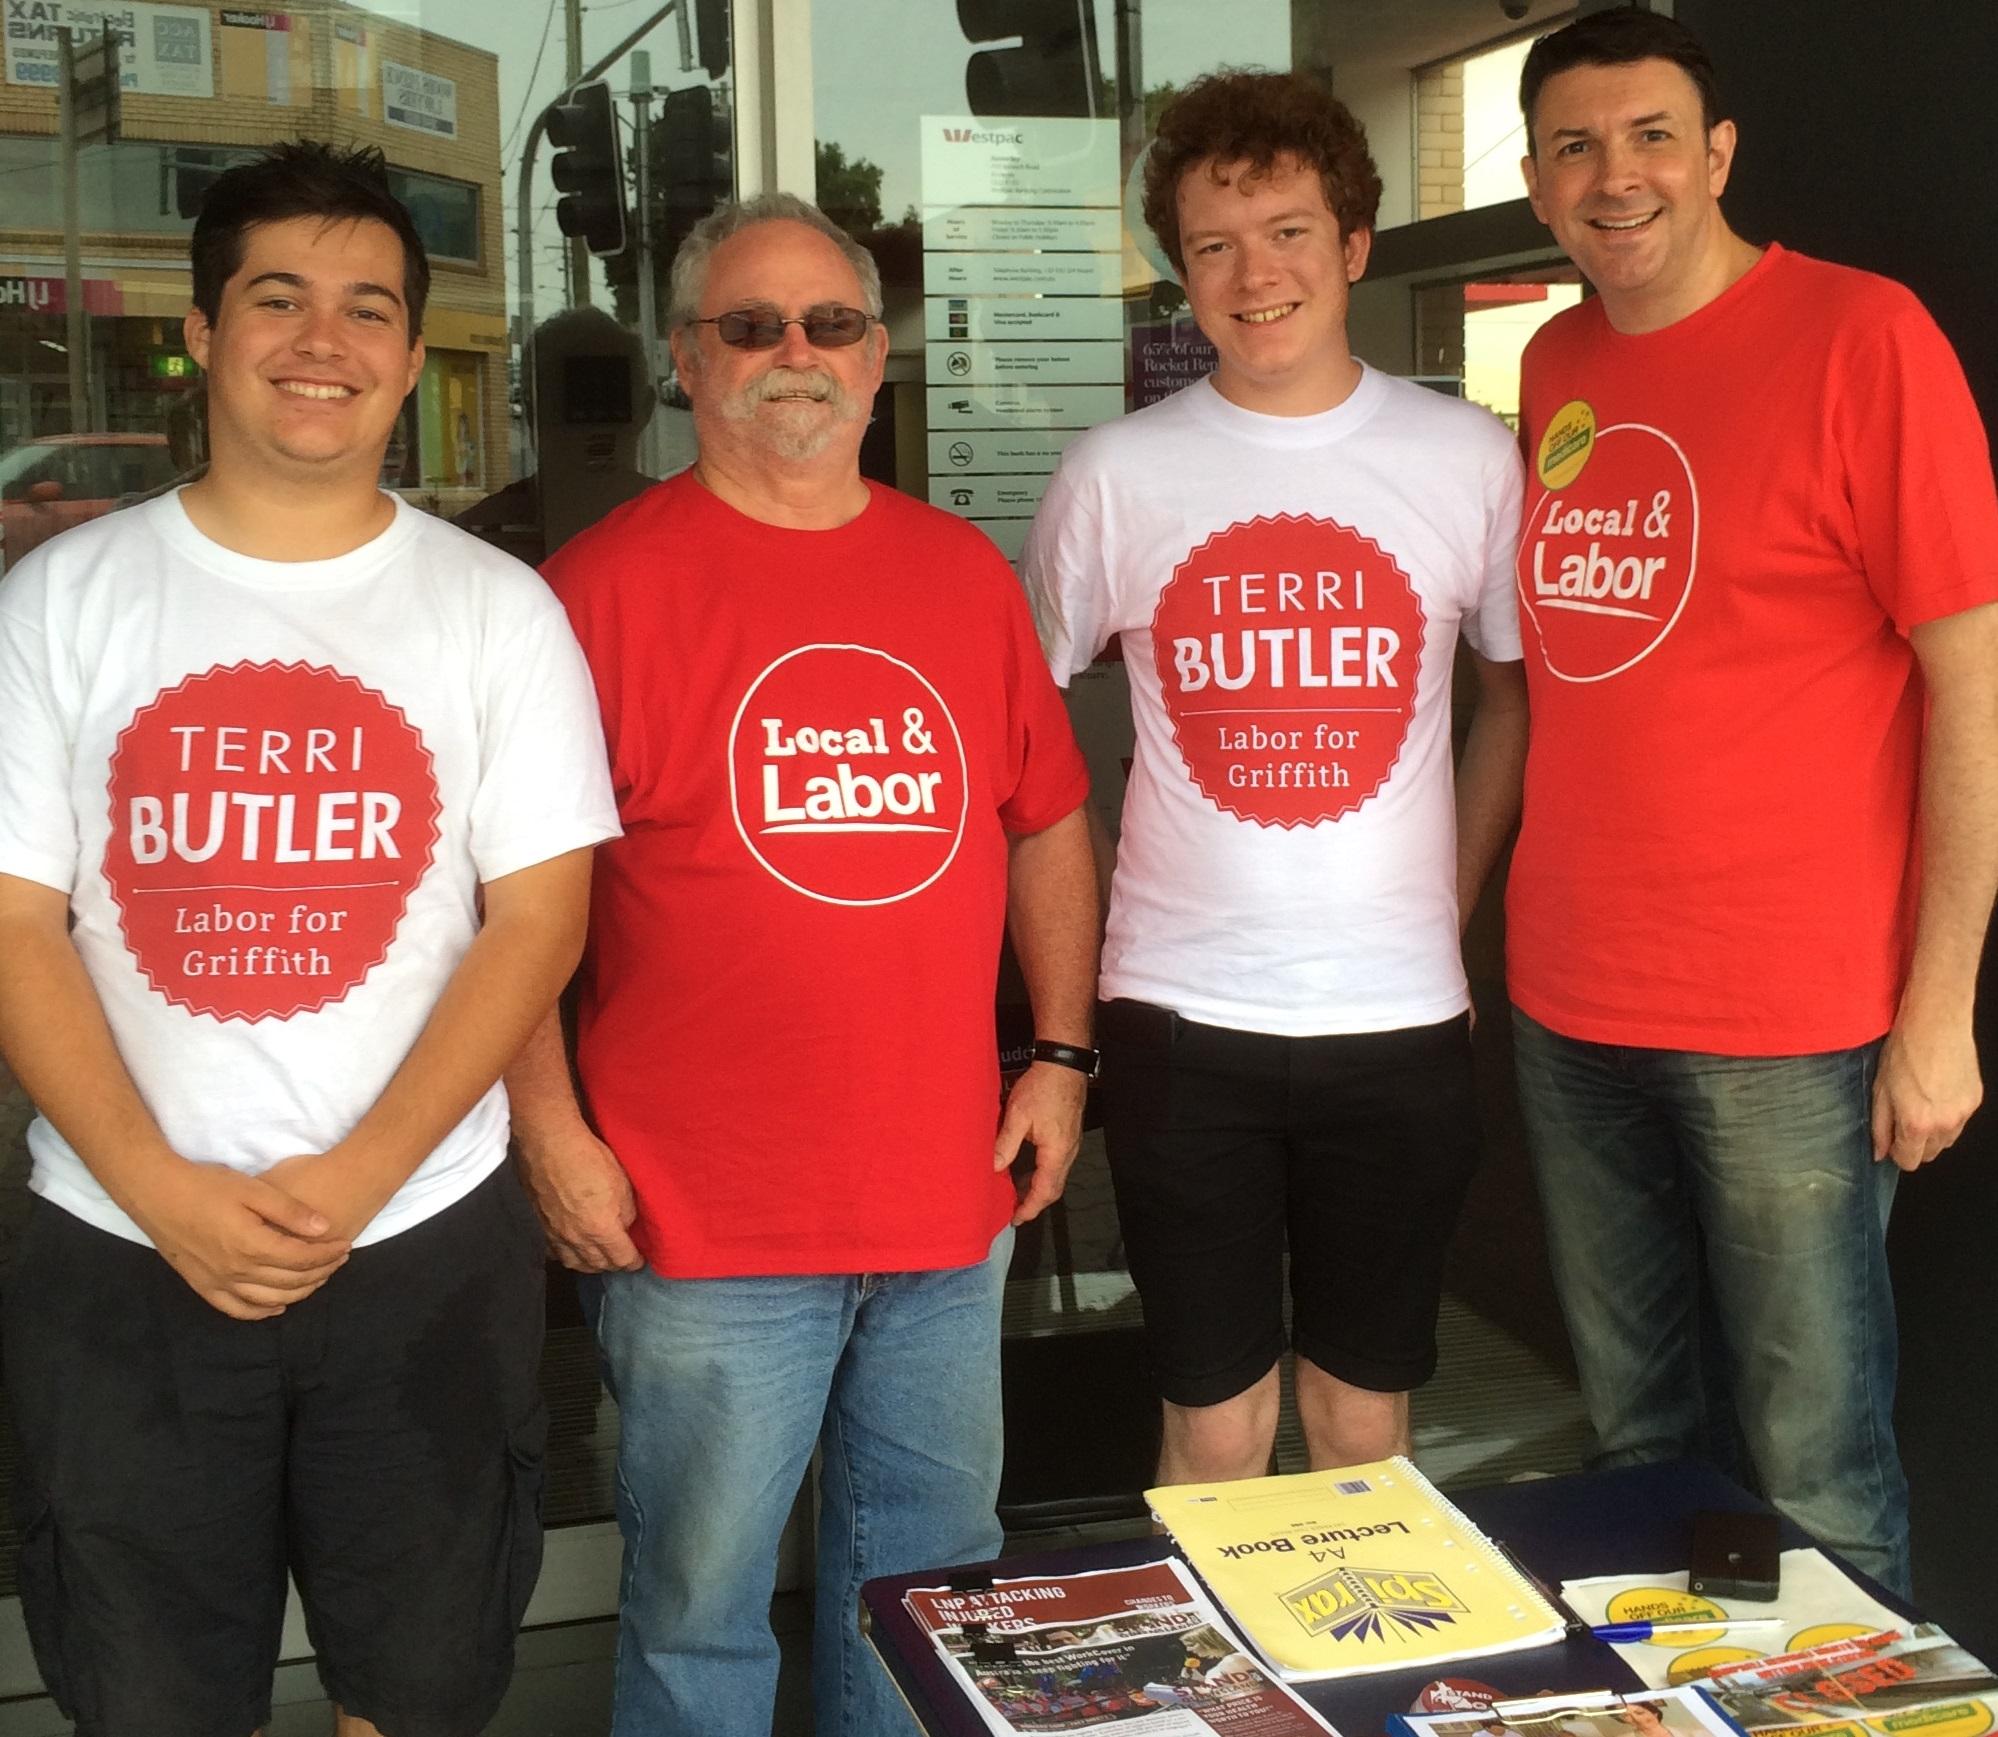 Picture of volunteers wearing Terri Butler 2014 tshirts